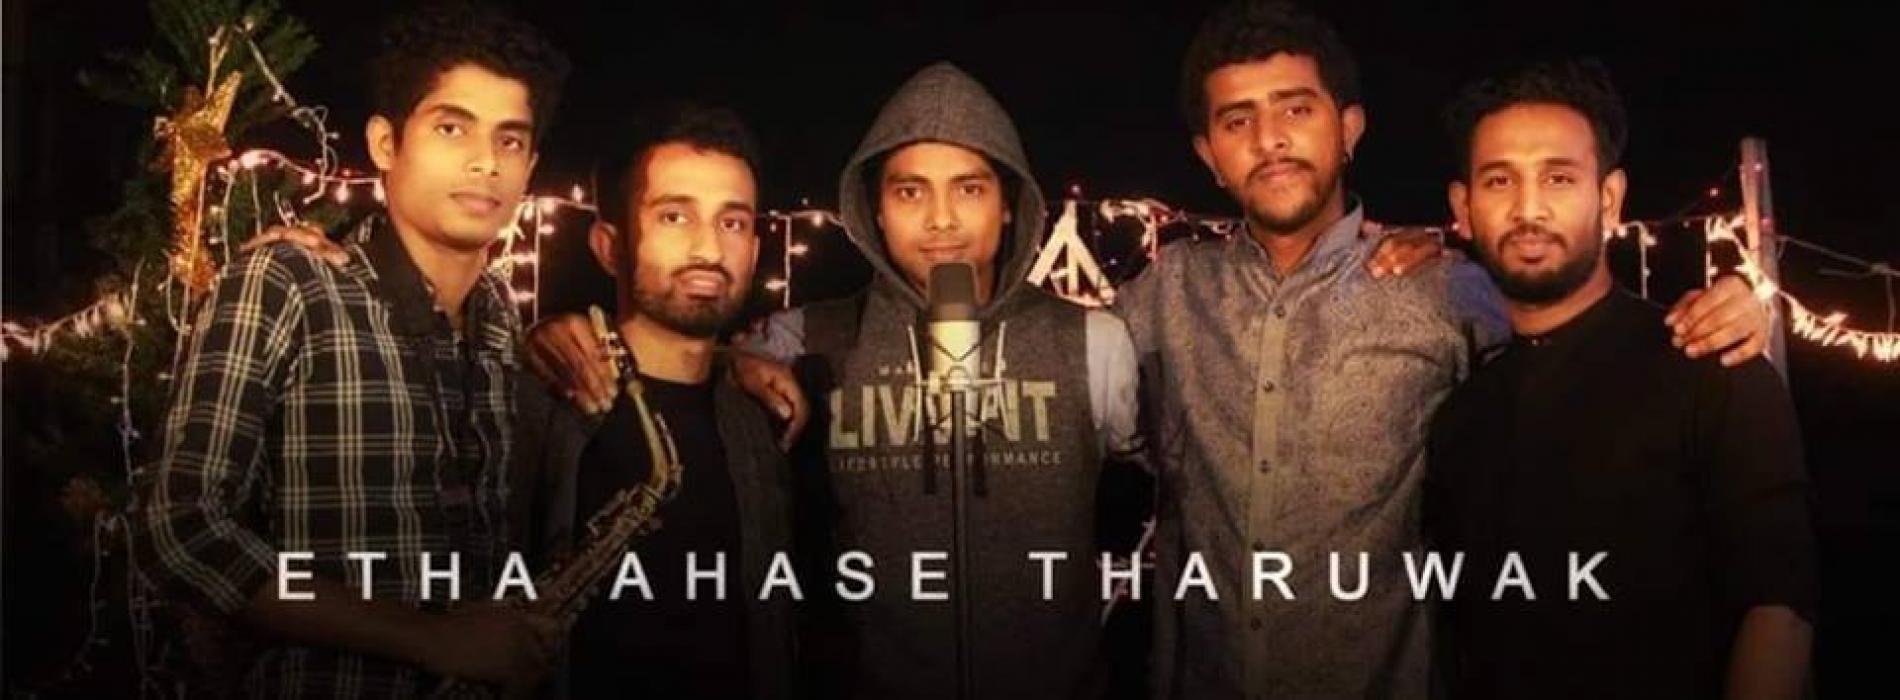 Etha Ahase Tharuwak ( ඈත අහසෙ තරුවක් ) ft. Sadara Bandara